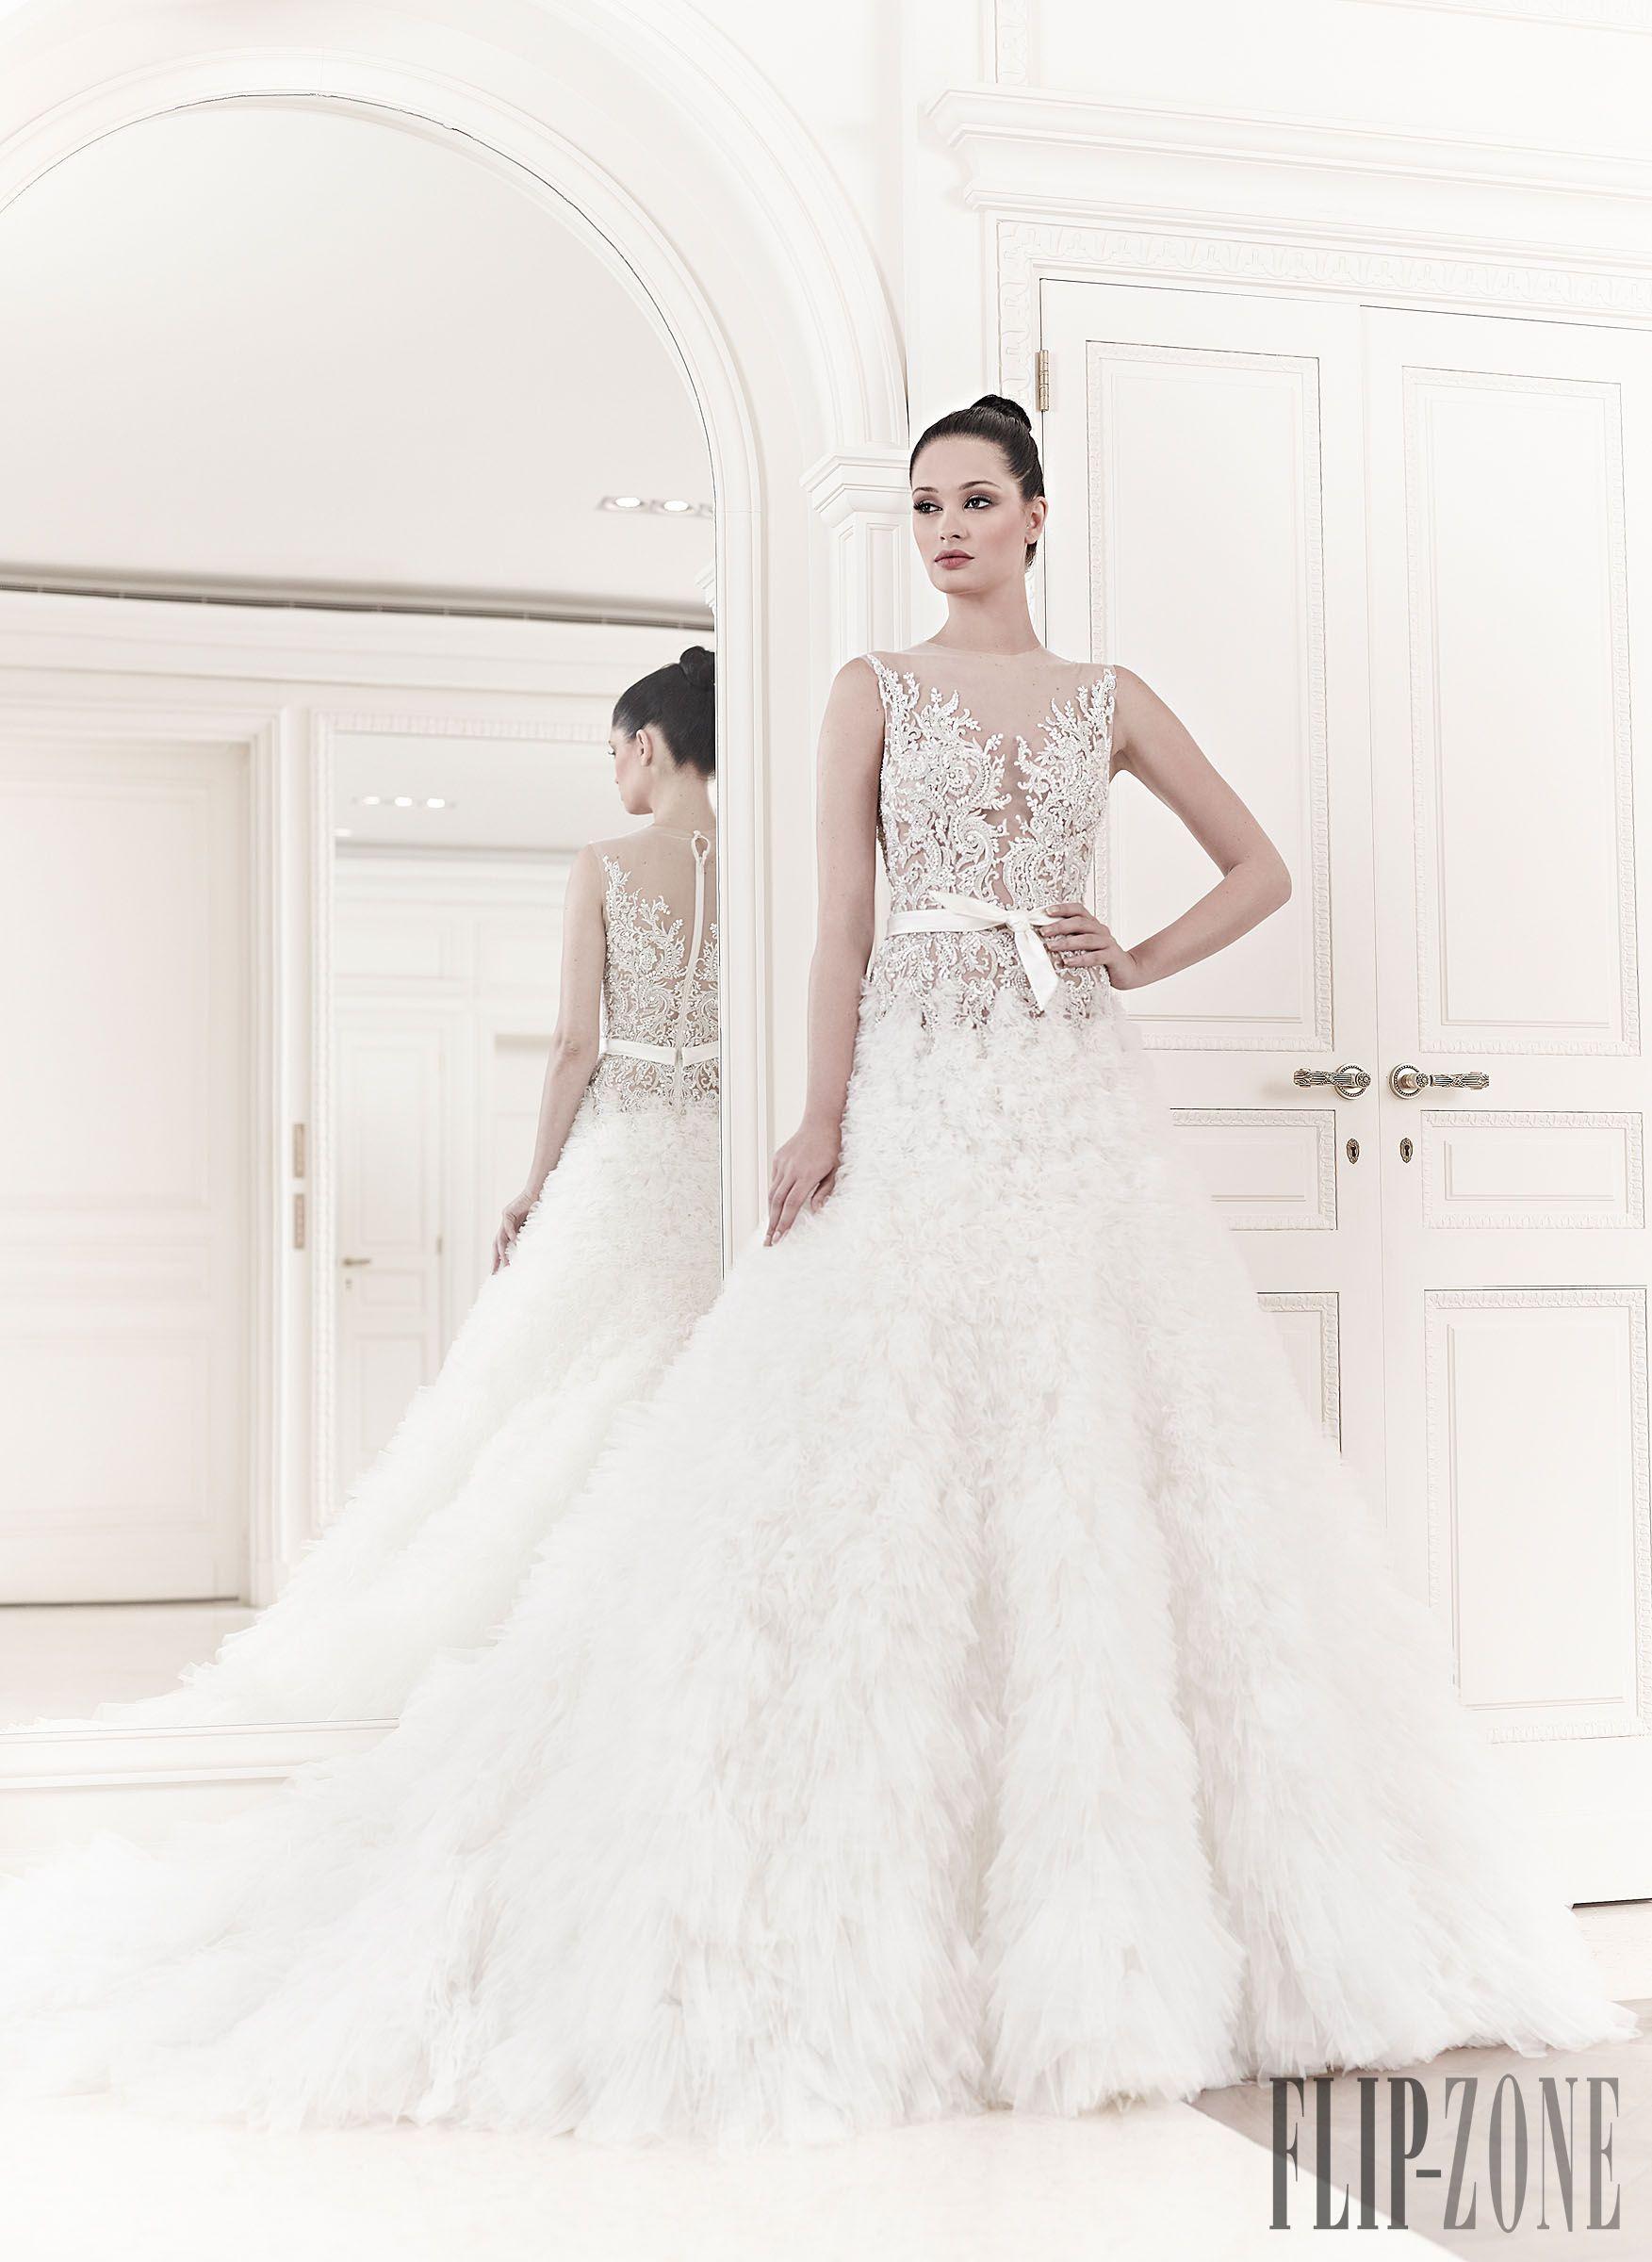 Zuhair Murad Spring-summer 2014 - Bridal - Elsa - http://www.flip-zone.com/fashion/bridal/the-bride/zuhair-murad-3952